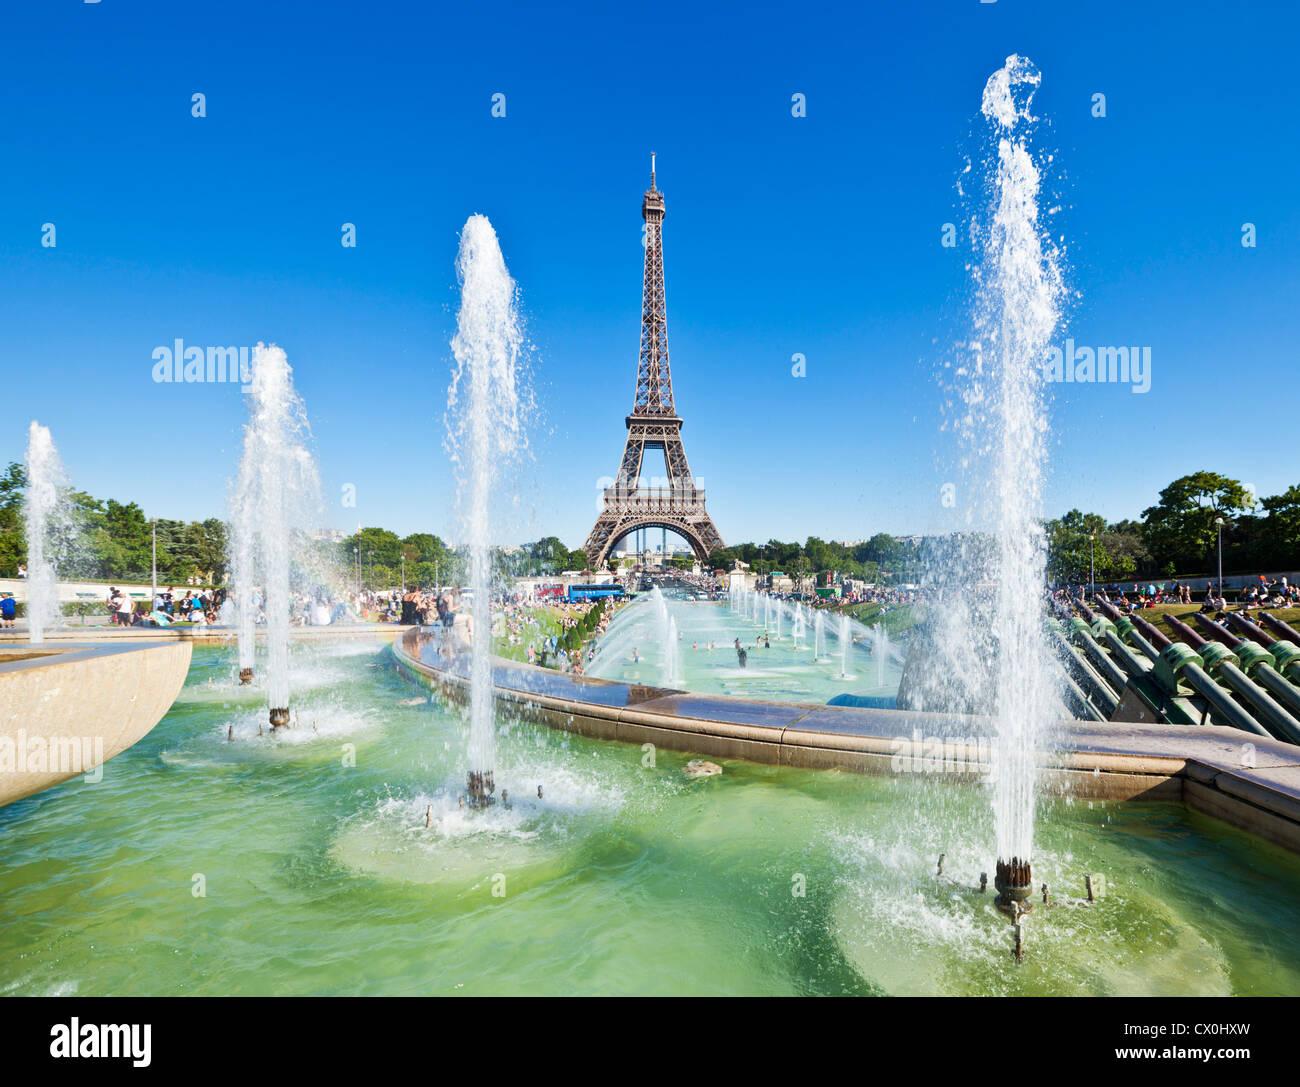 Paris skyline France EU Europe Eiffel tower with trocadero fountains - Stock Image